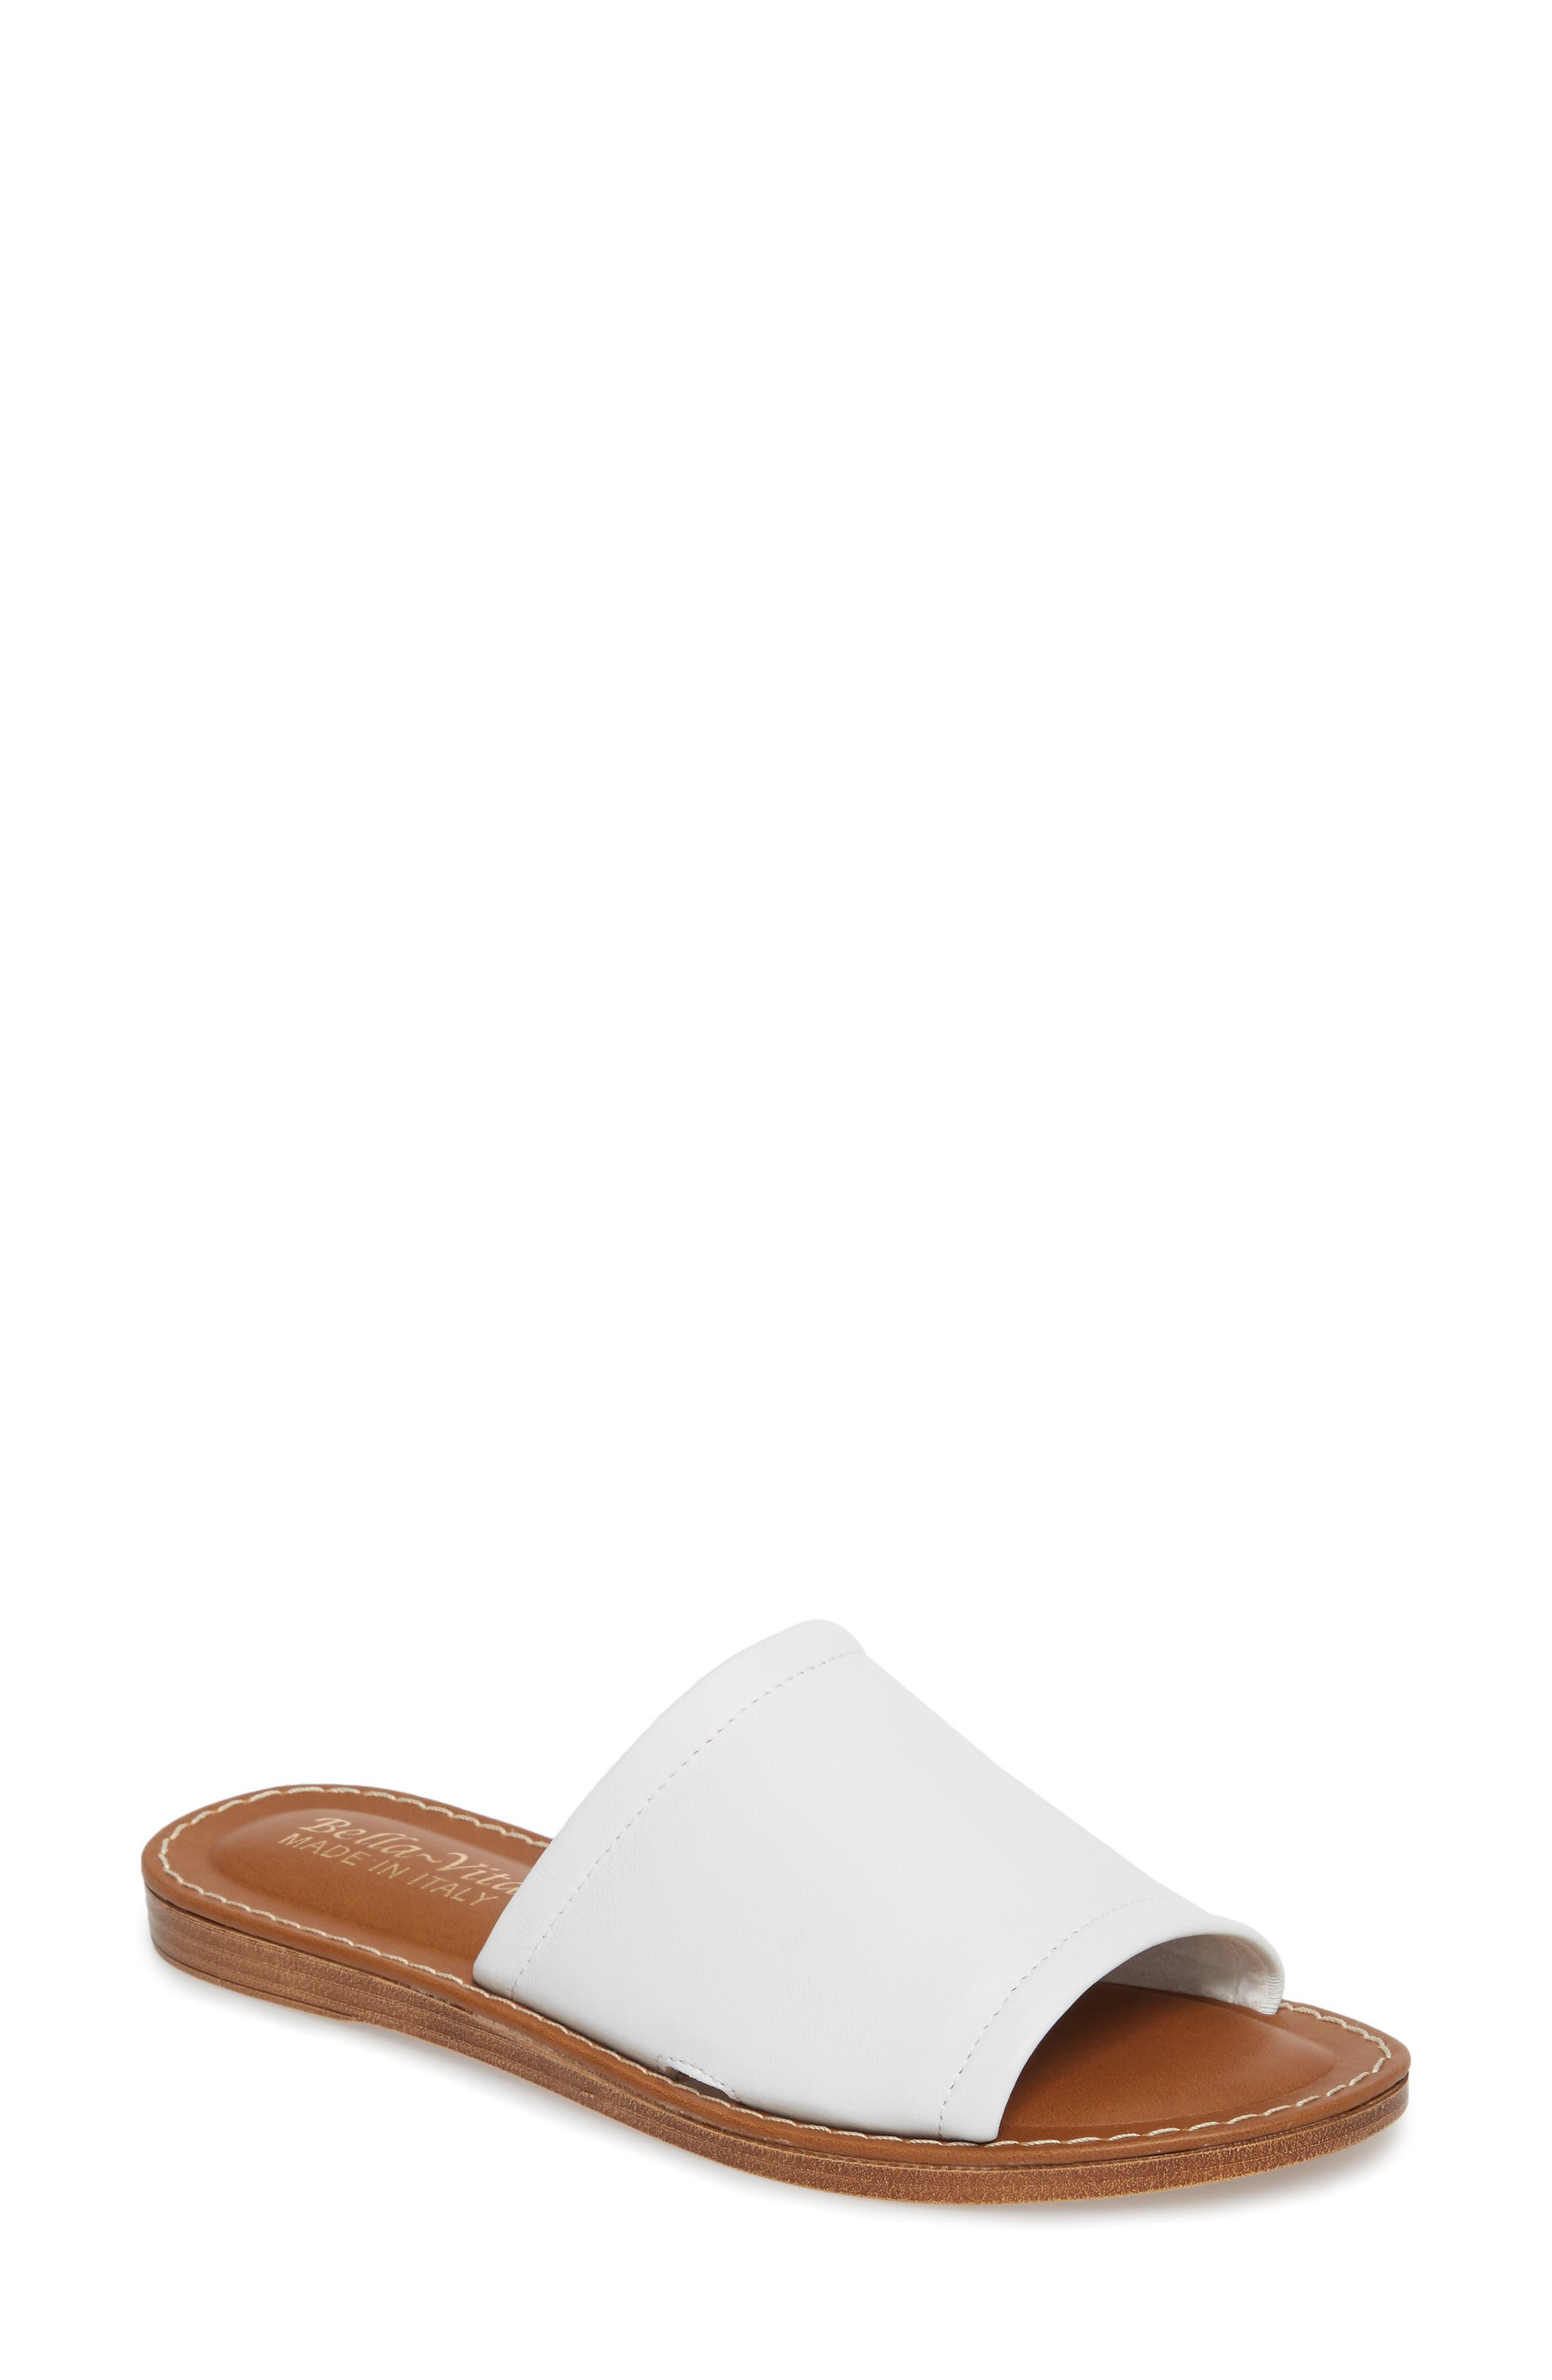 BELLA VITA, Ros Slide Sandal, Main thumbnail 1, color, WHITE LEATHER